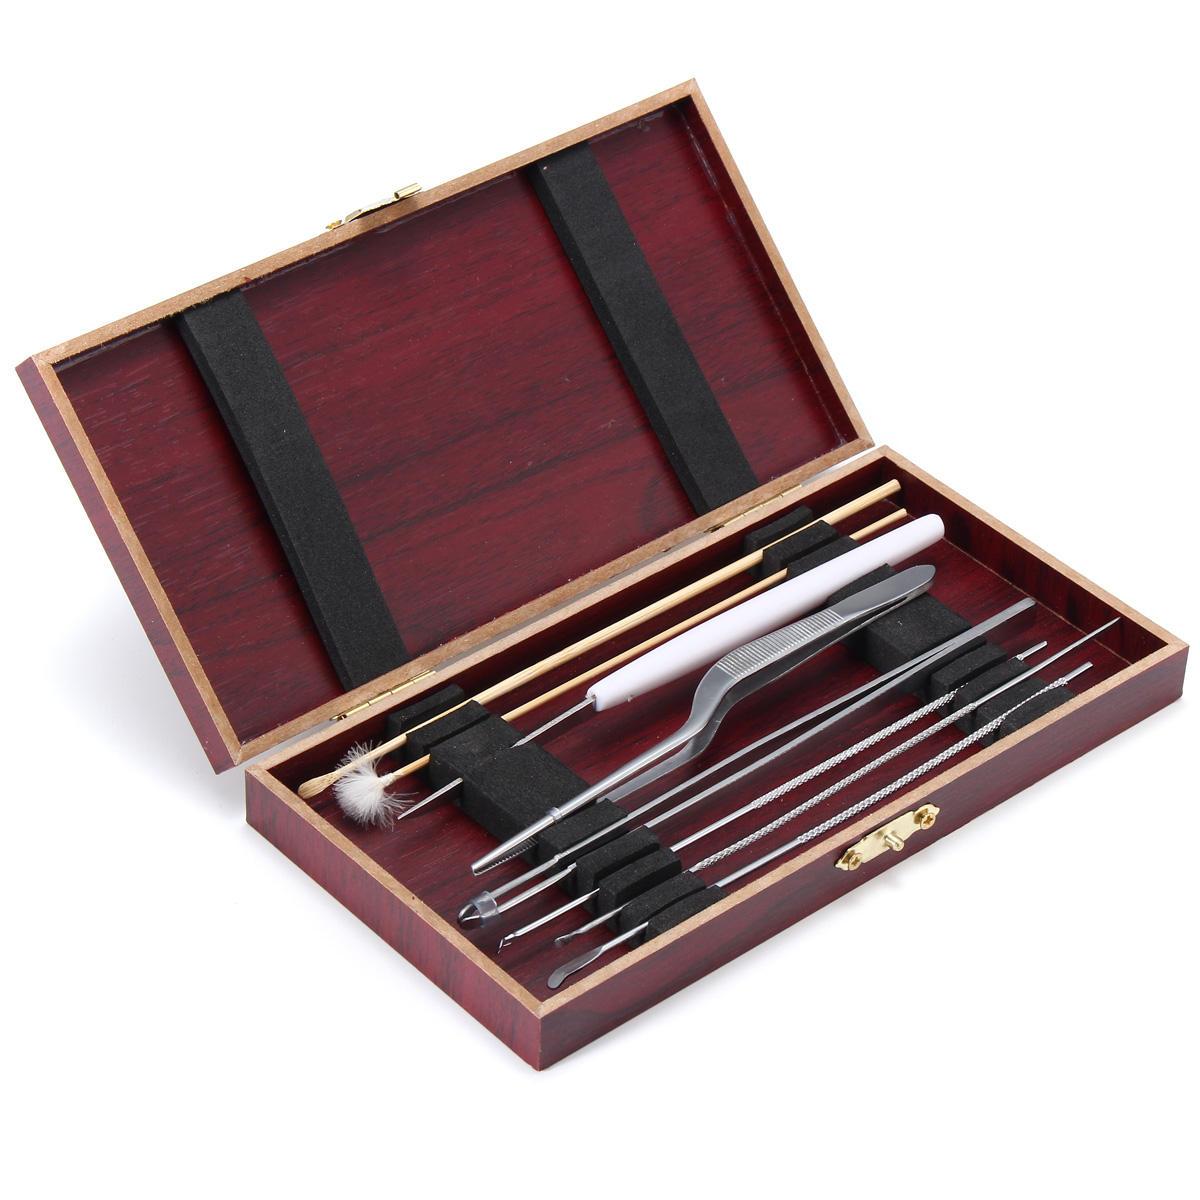 8pcs Stainless Steel Wood Ear Pick Wax Removal Dirt Curette Leaner Kit